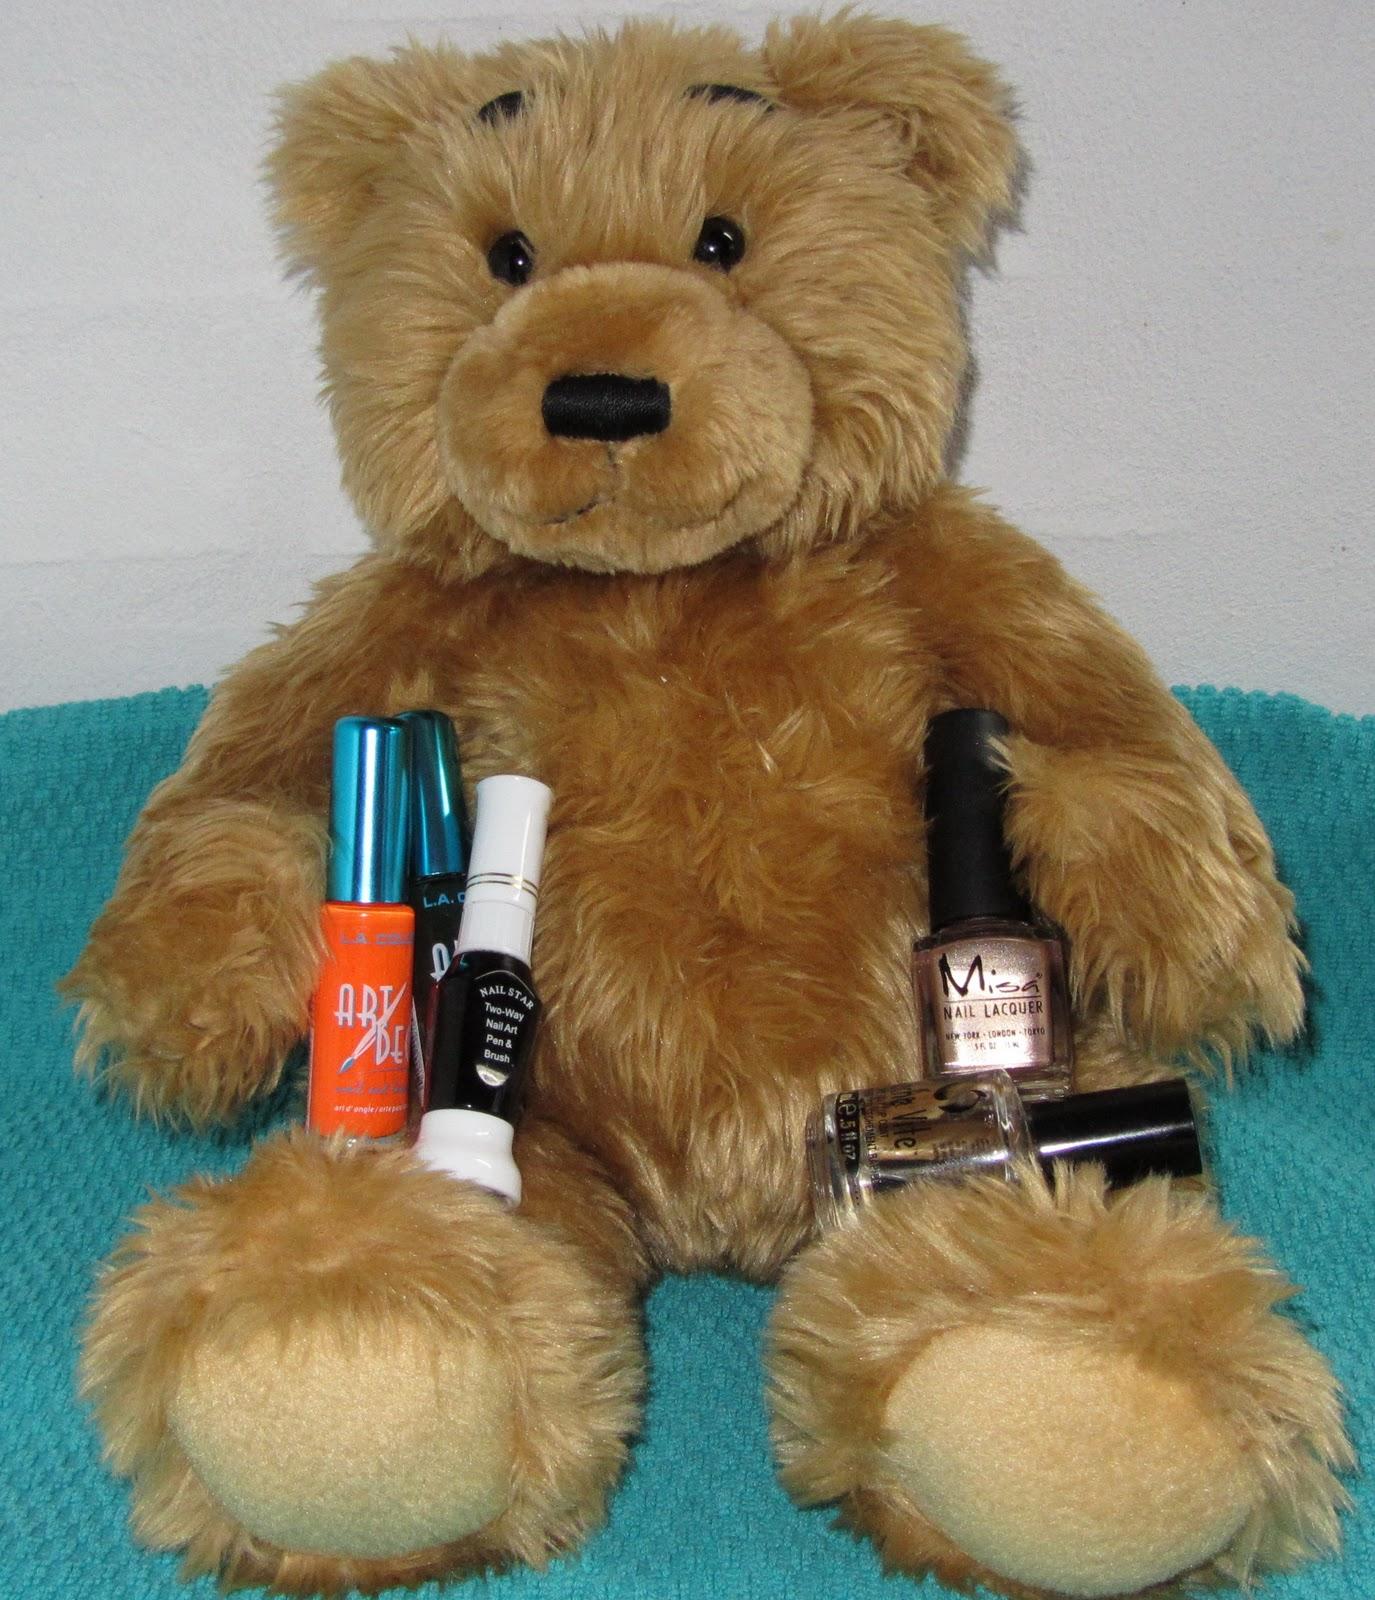 Bear Stripers teddy bear with plaid nails - bamse med sutsko/plaid negle